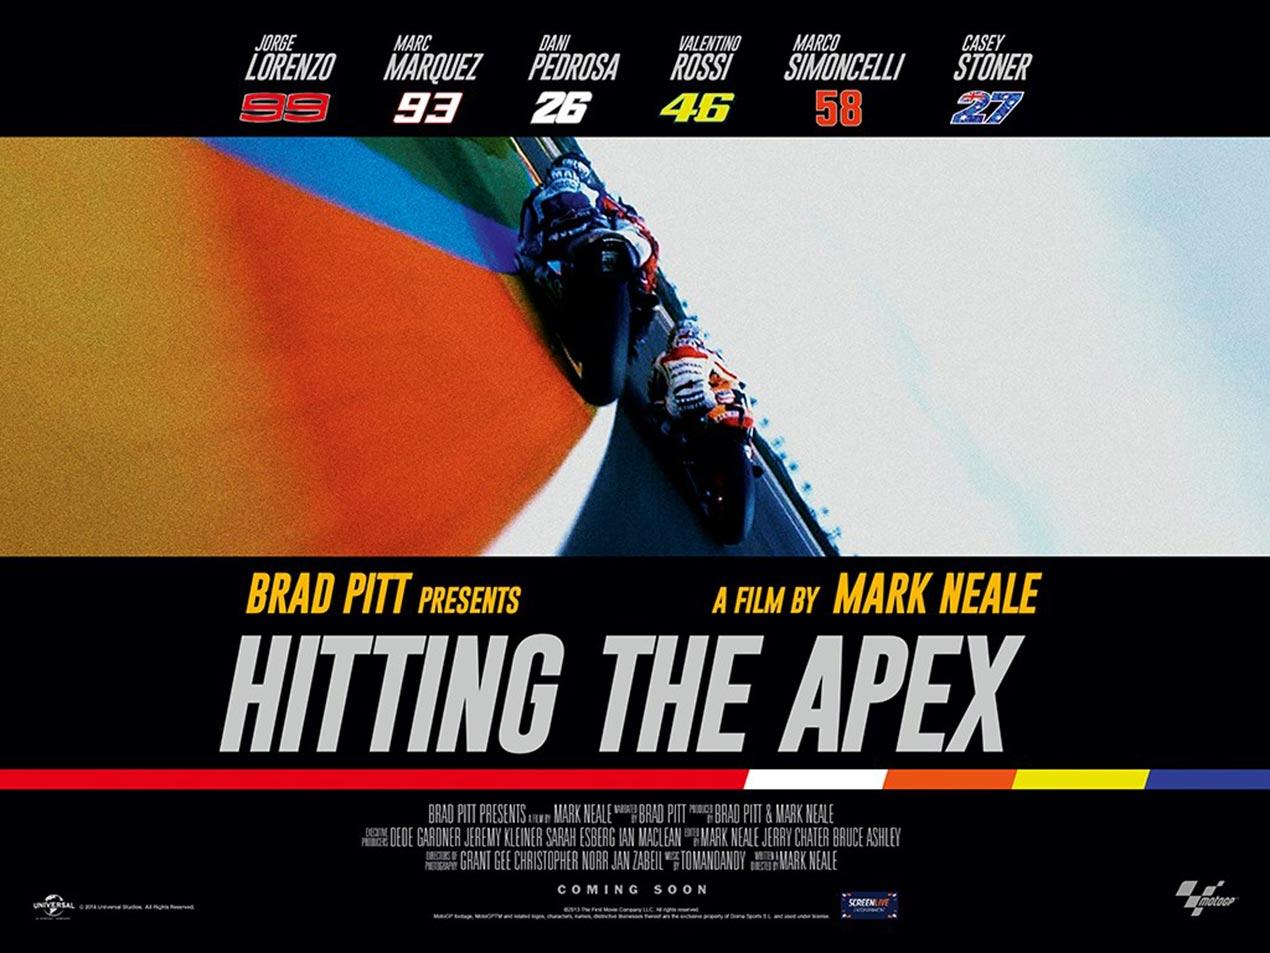 Hitting the Apex - Mark Neale's New Movie About MotoGP - Asphalt & Rubber